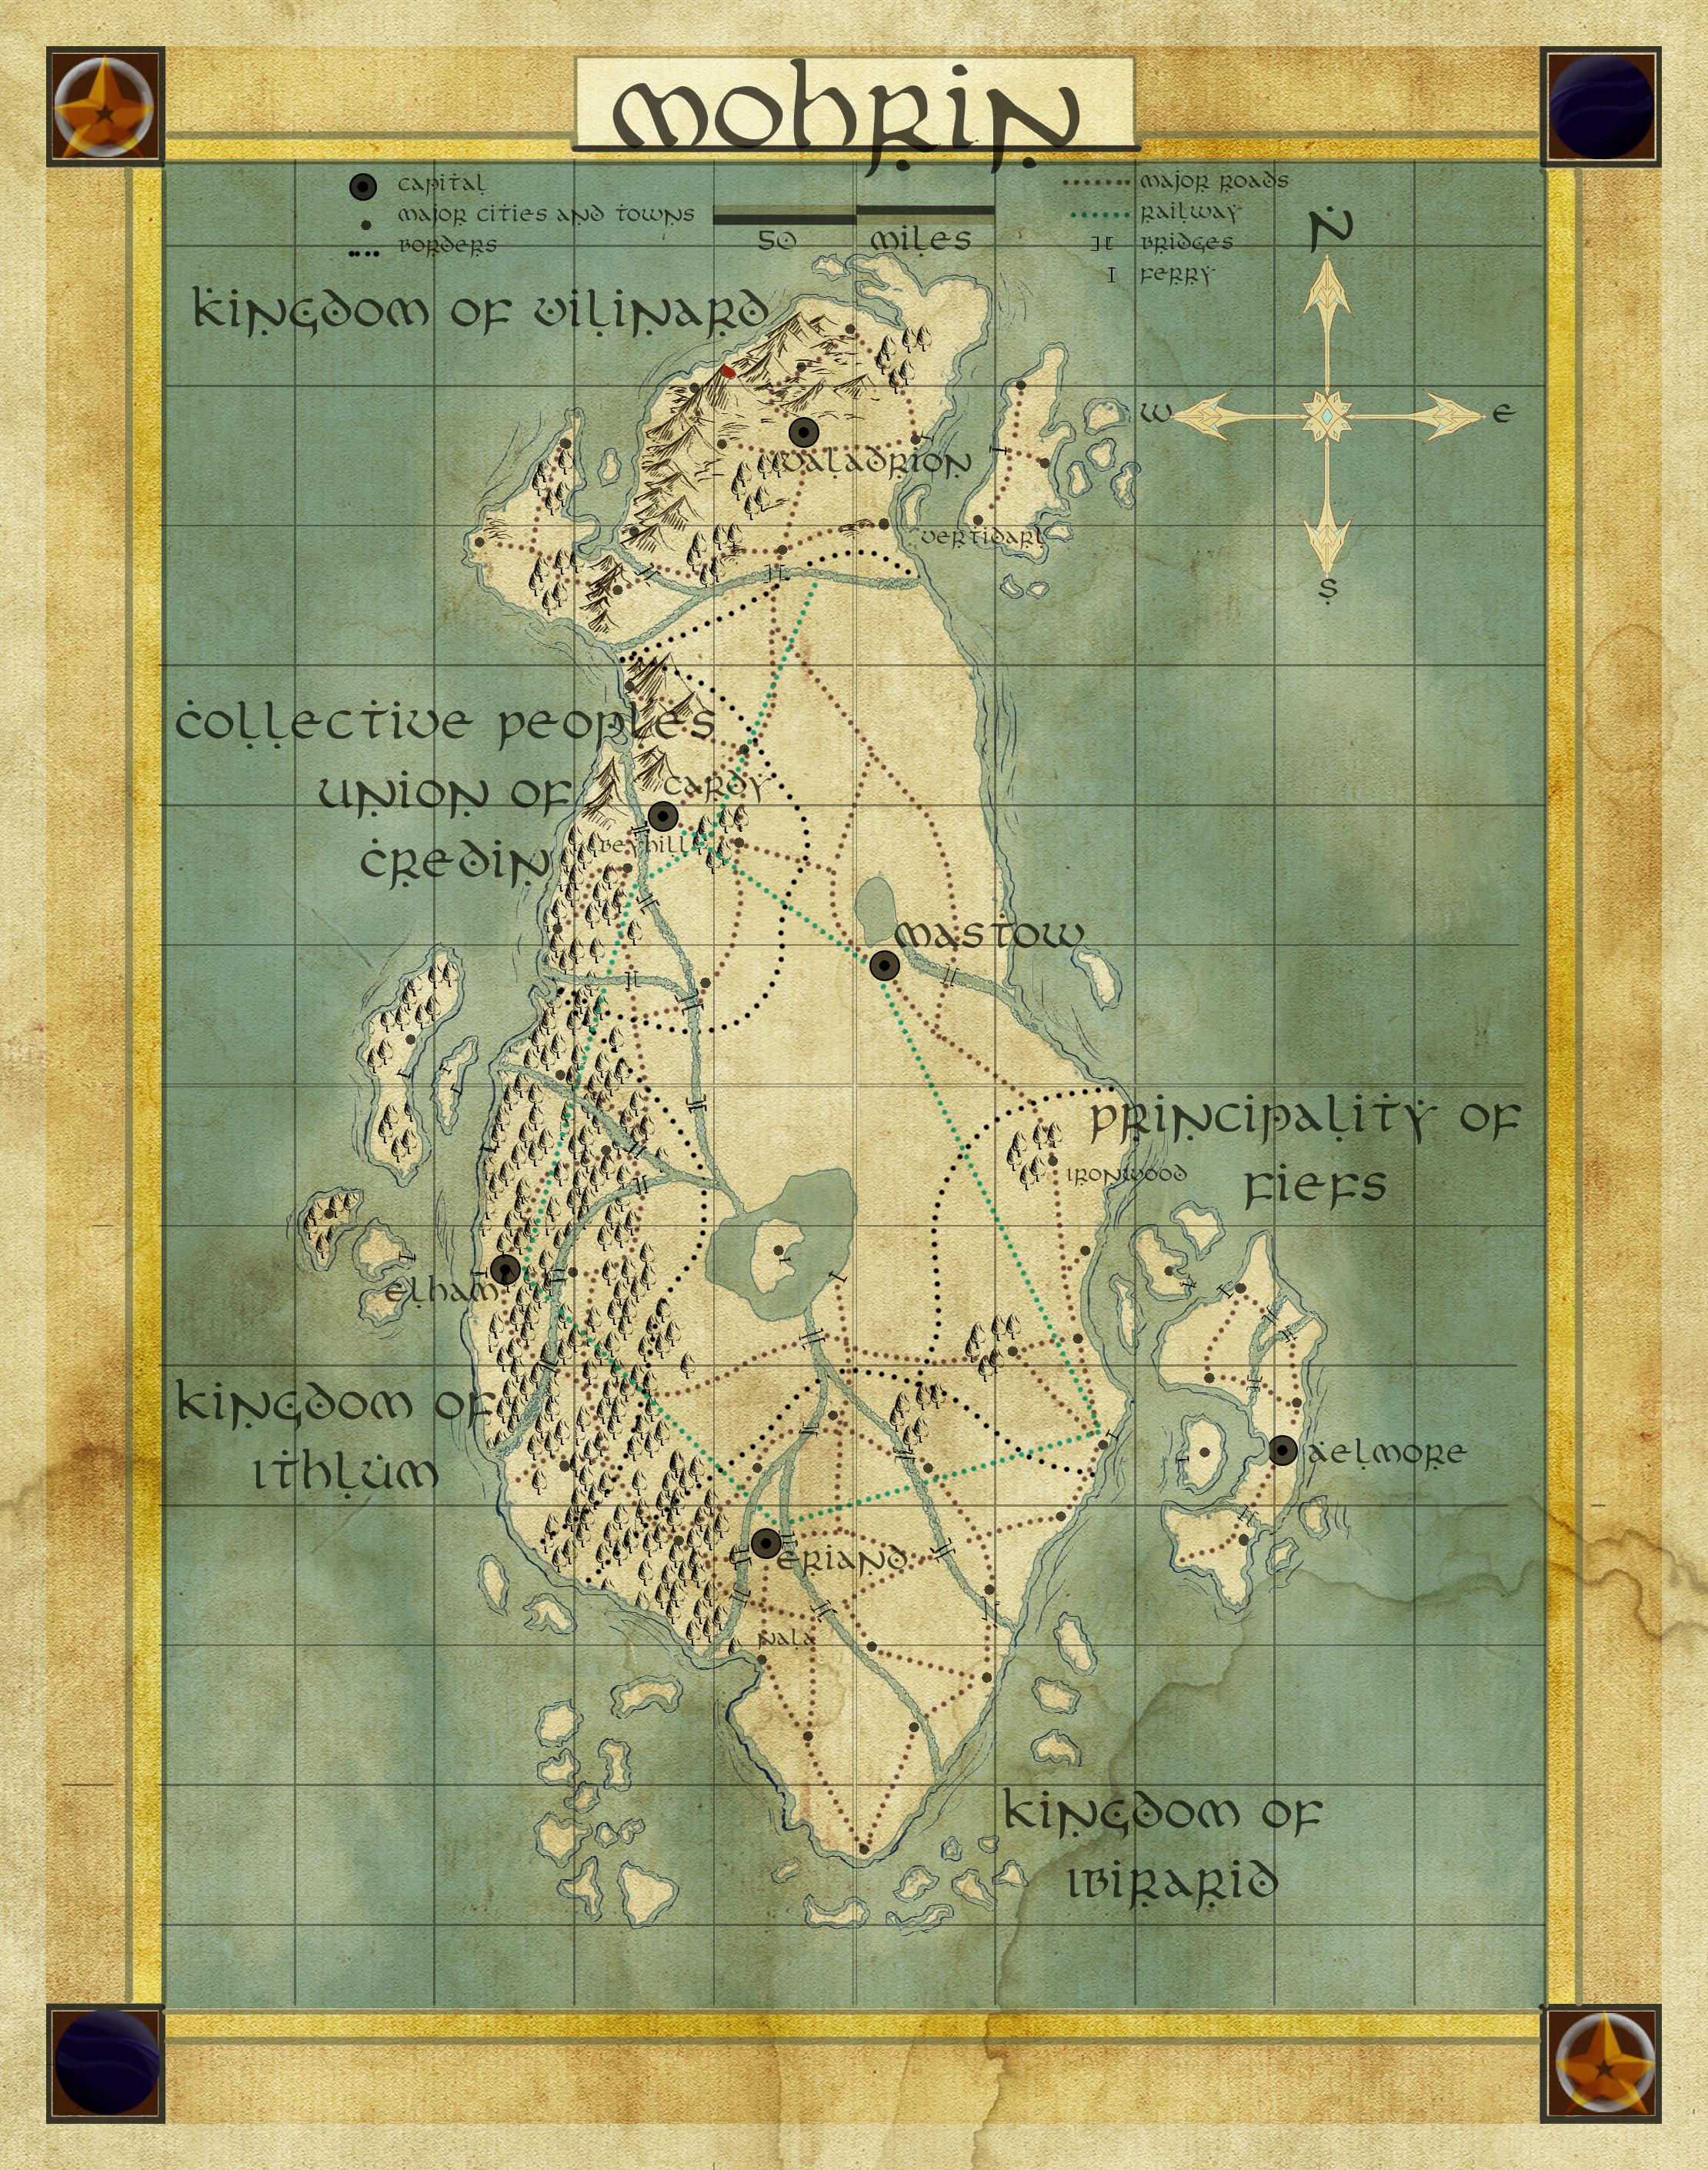 Final map of Mohrin